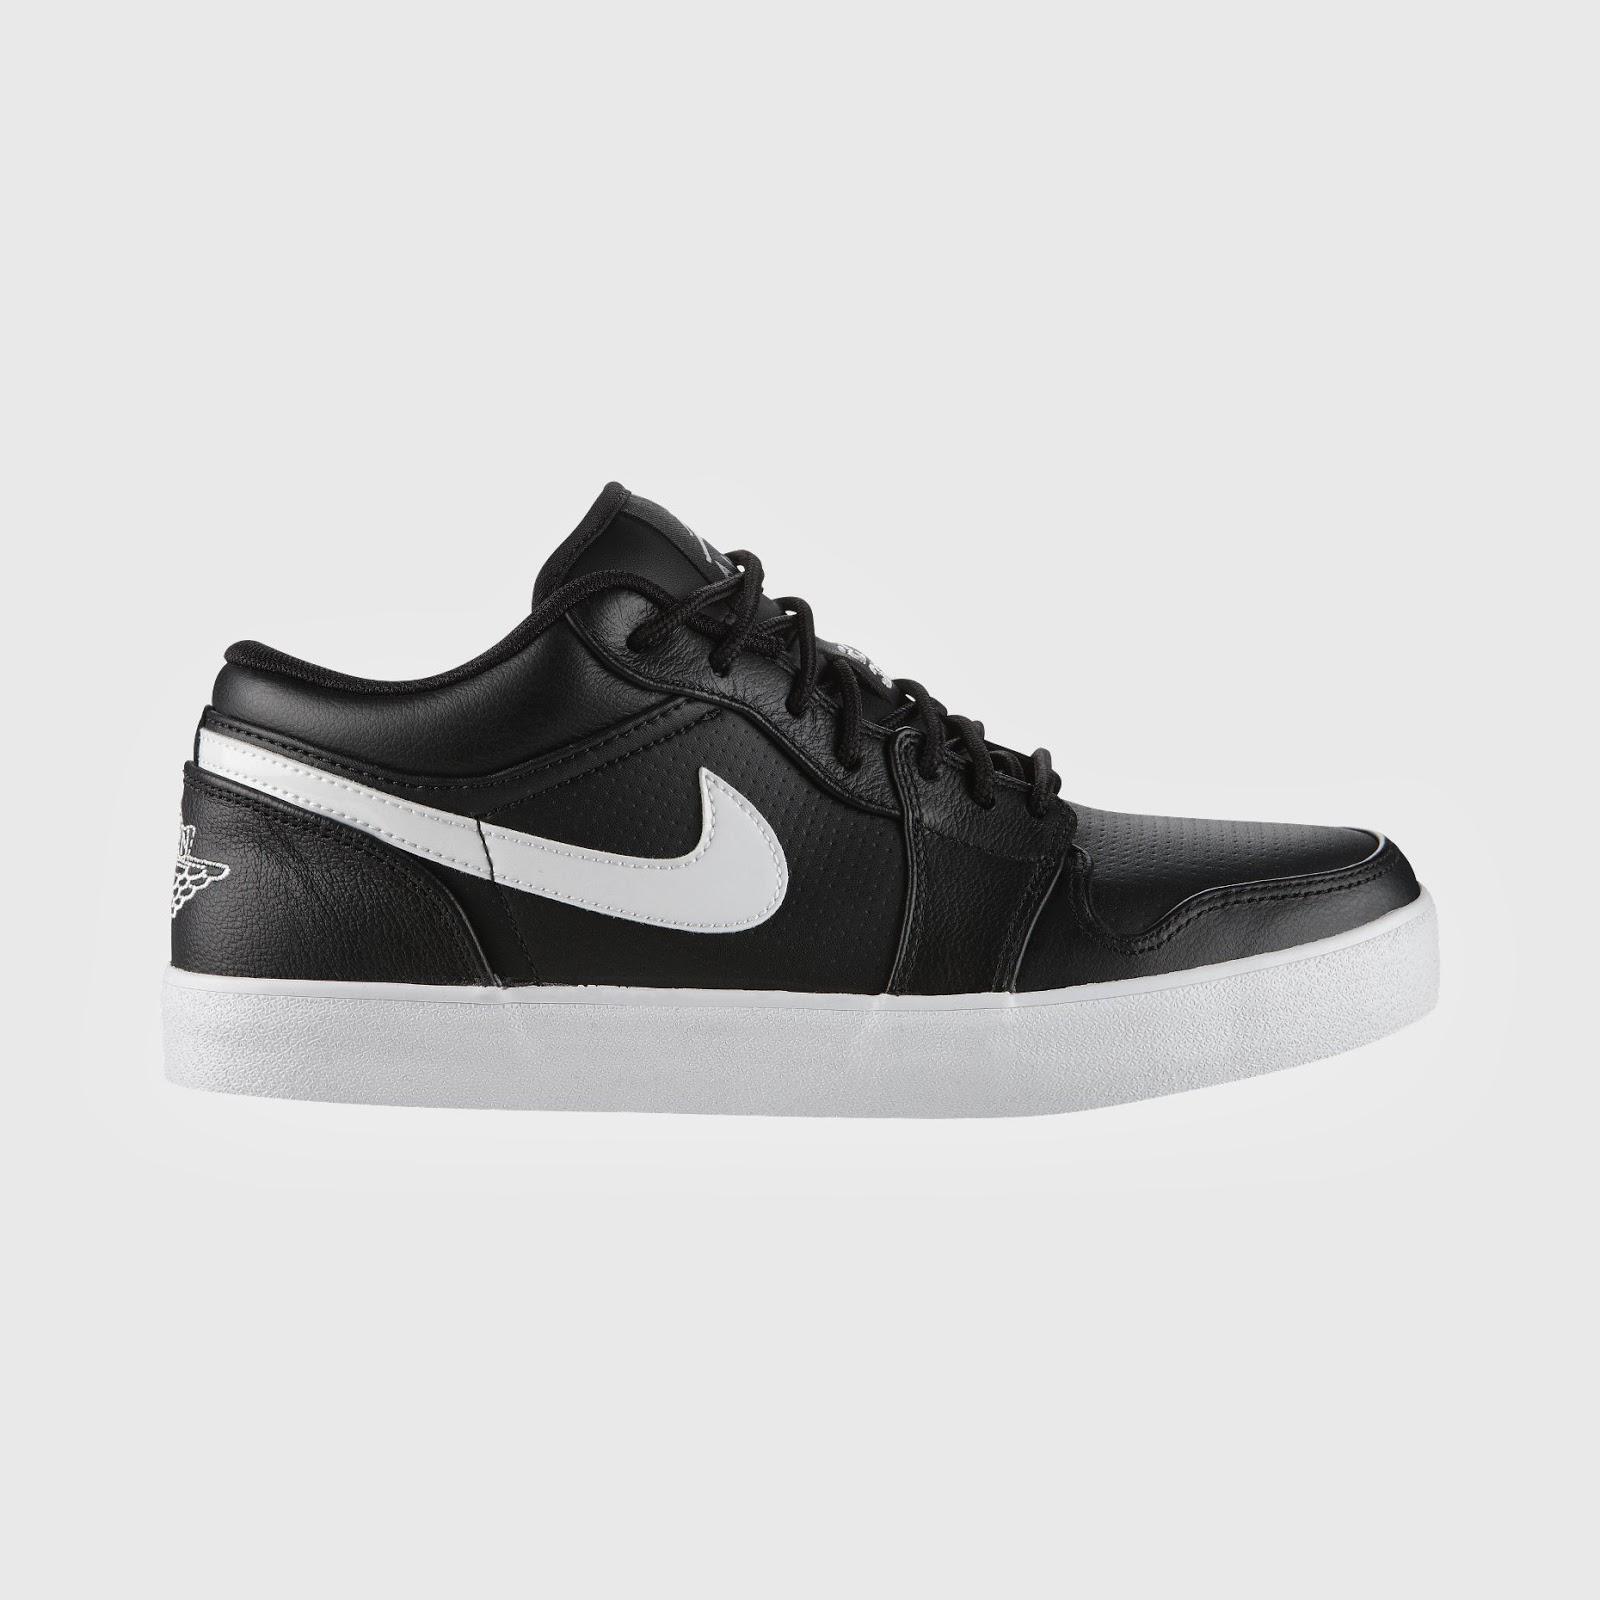 6a508d614109 Nike Air Jordan Retro Basketball Shoes and Sandals!  AIR JORDAN V.2 ...